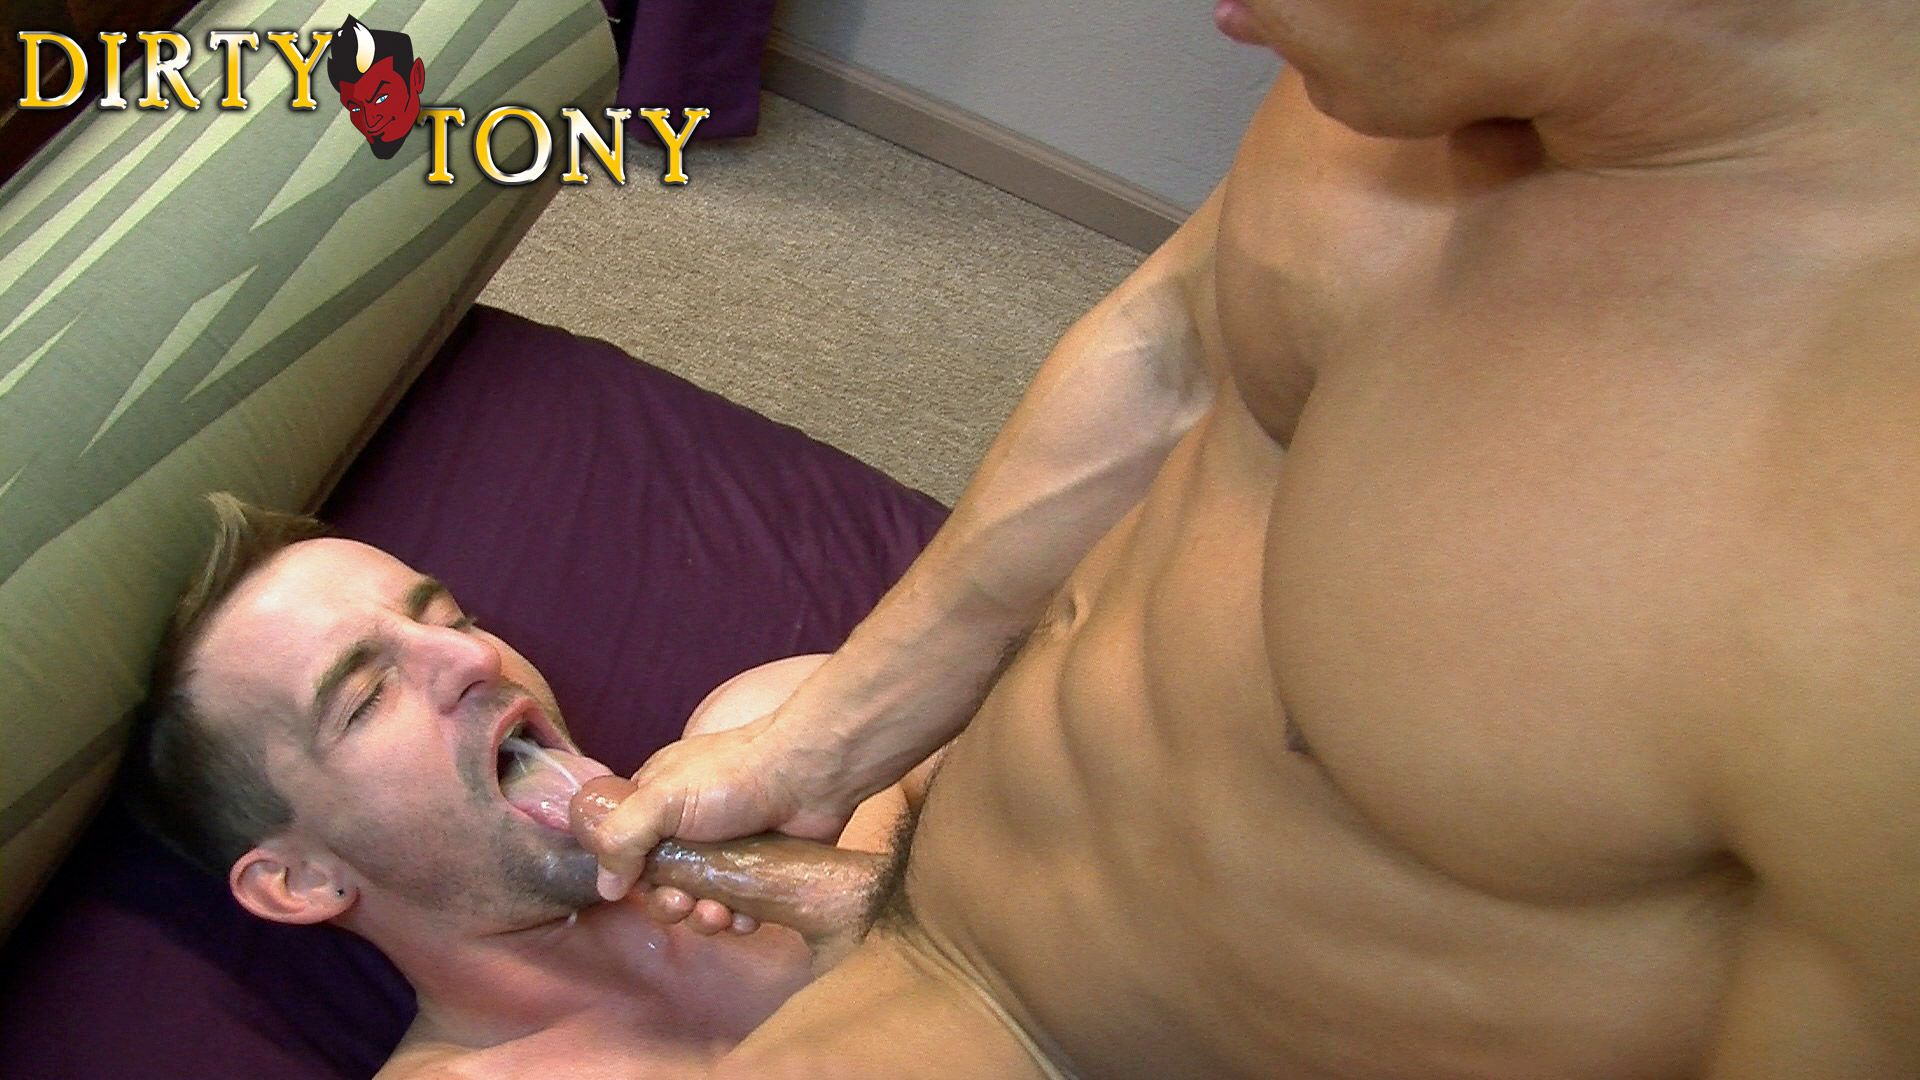 Dirty-Tony-51-Cum-Shots-Cum-Facials-Cum-Eating-Jizz-Eating-Muscle-Guys-Eating-Cum-01 This is hot... 51 Amateur Cum Shots in Random Guys Faces